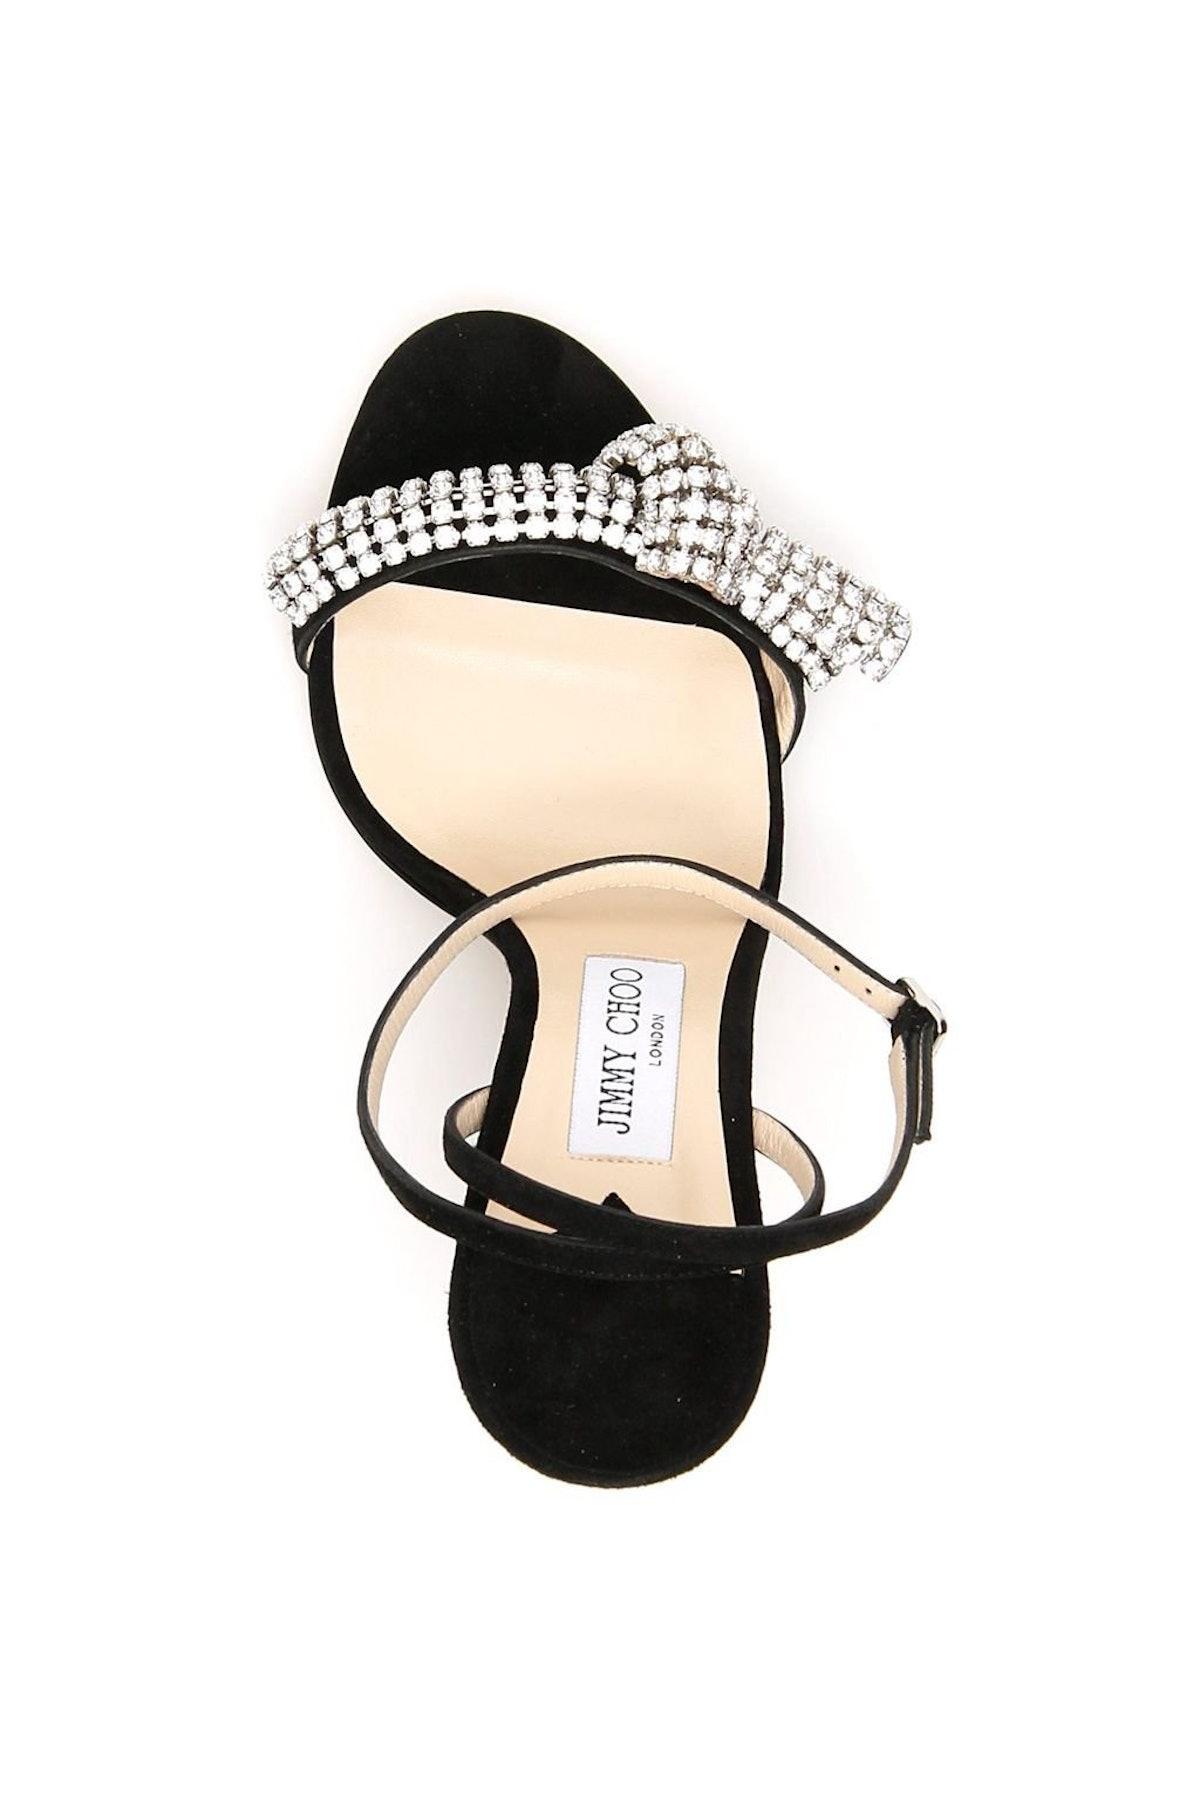 Jimmy Choo Thyra Crystal Sandals: additional image